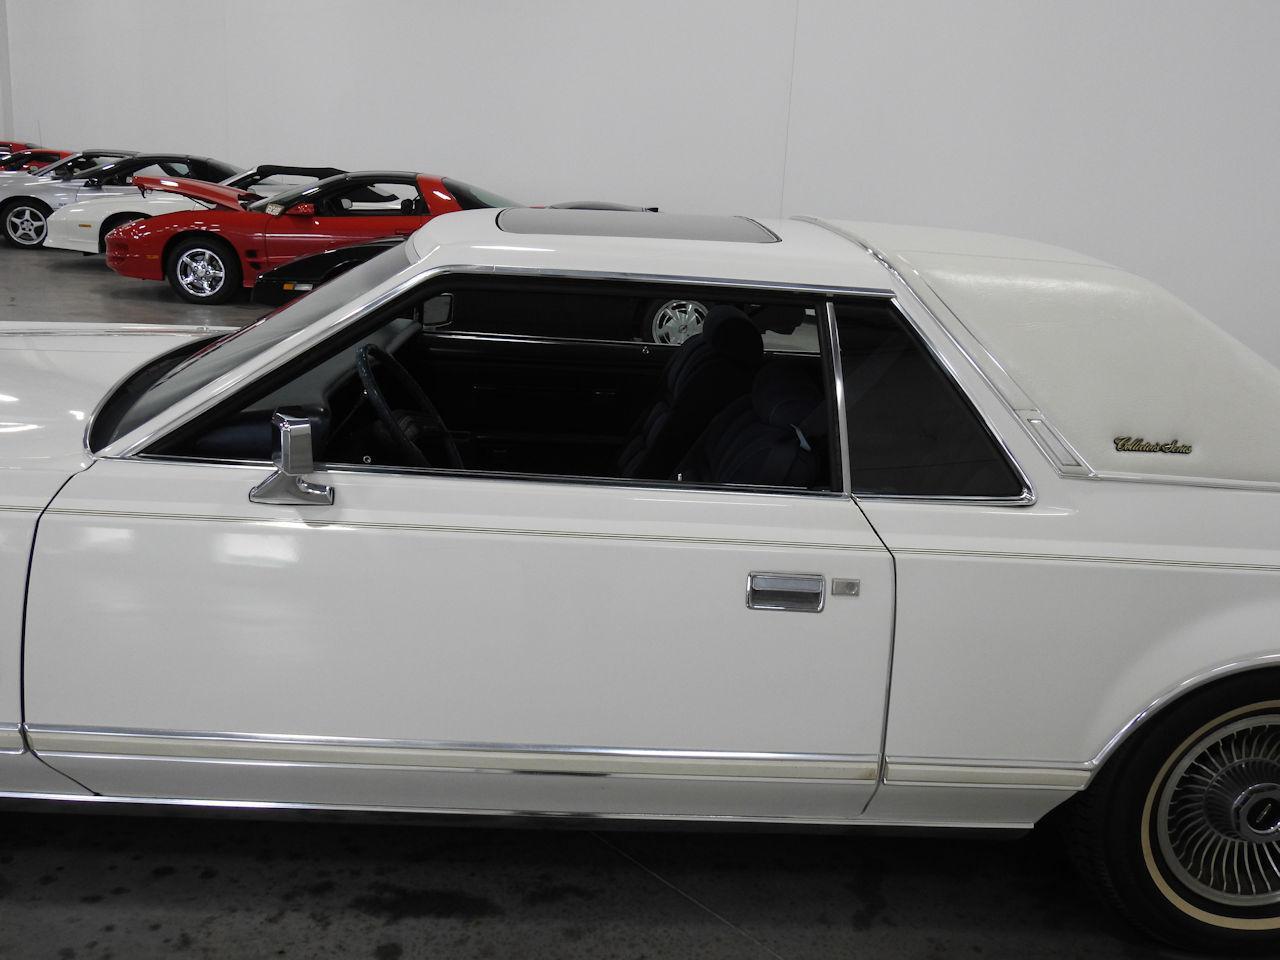 1979 Lincoln MKV 38